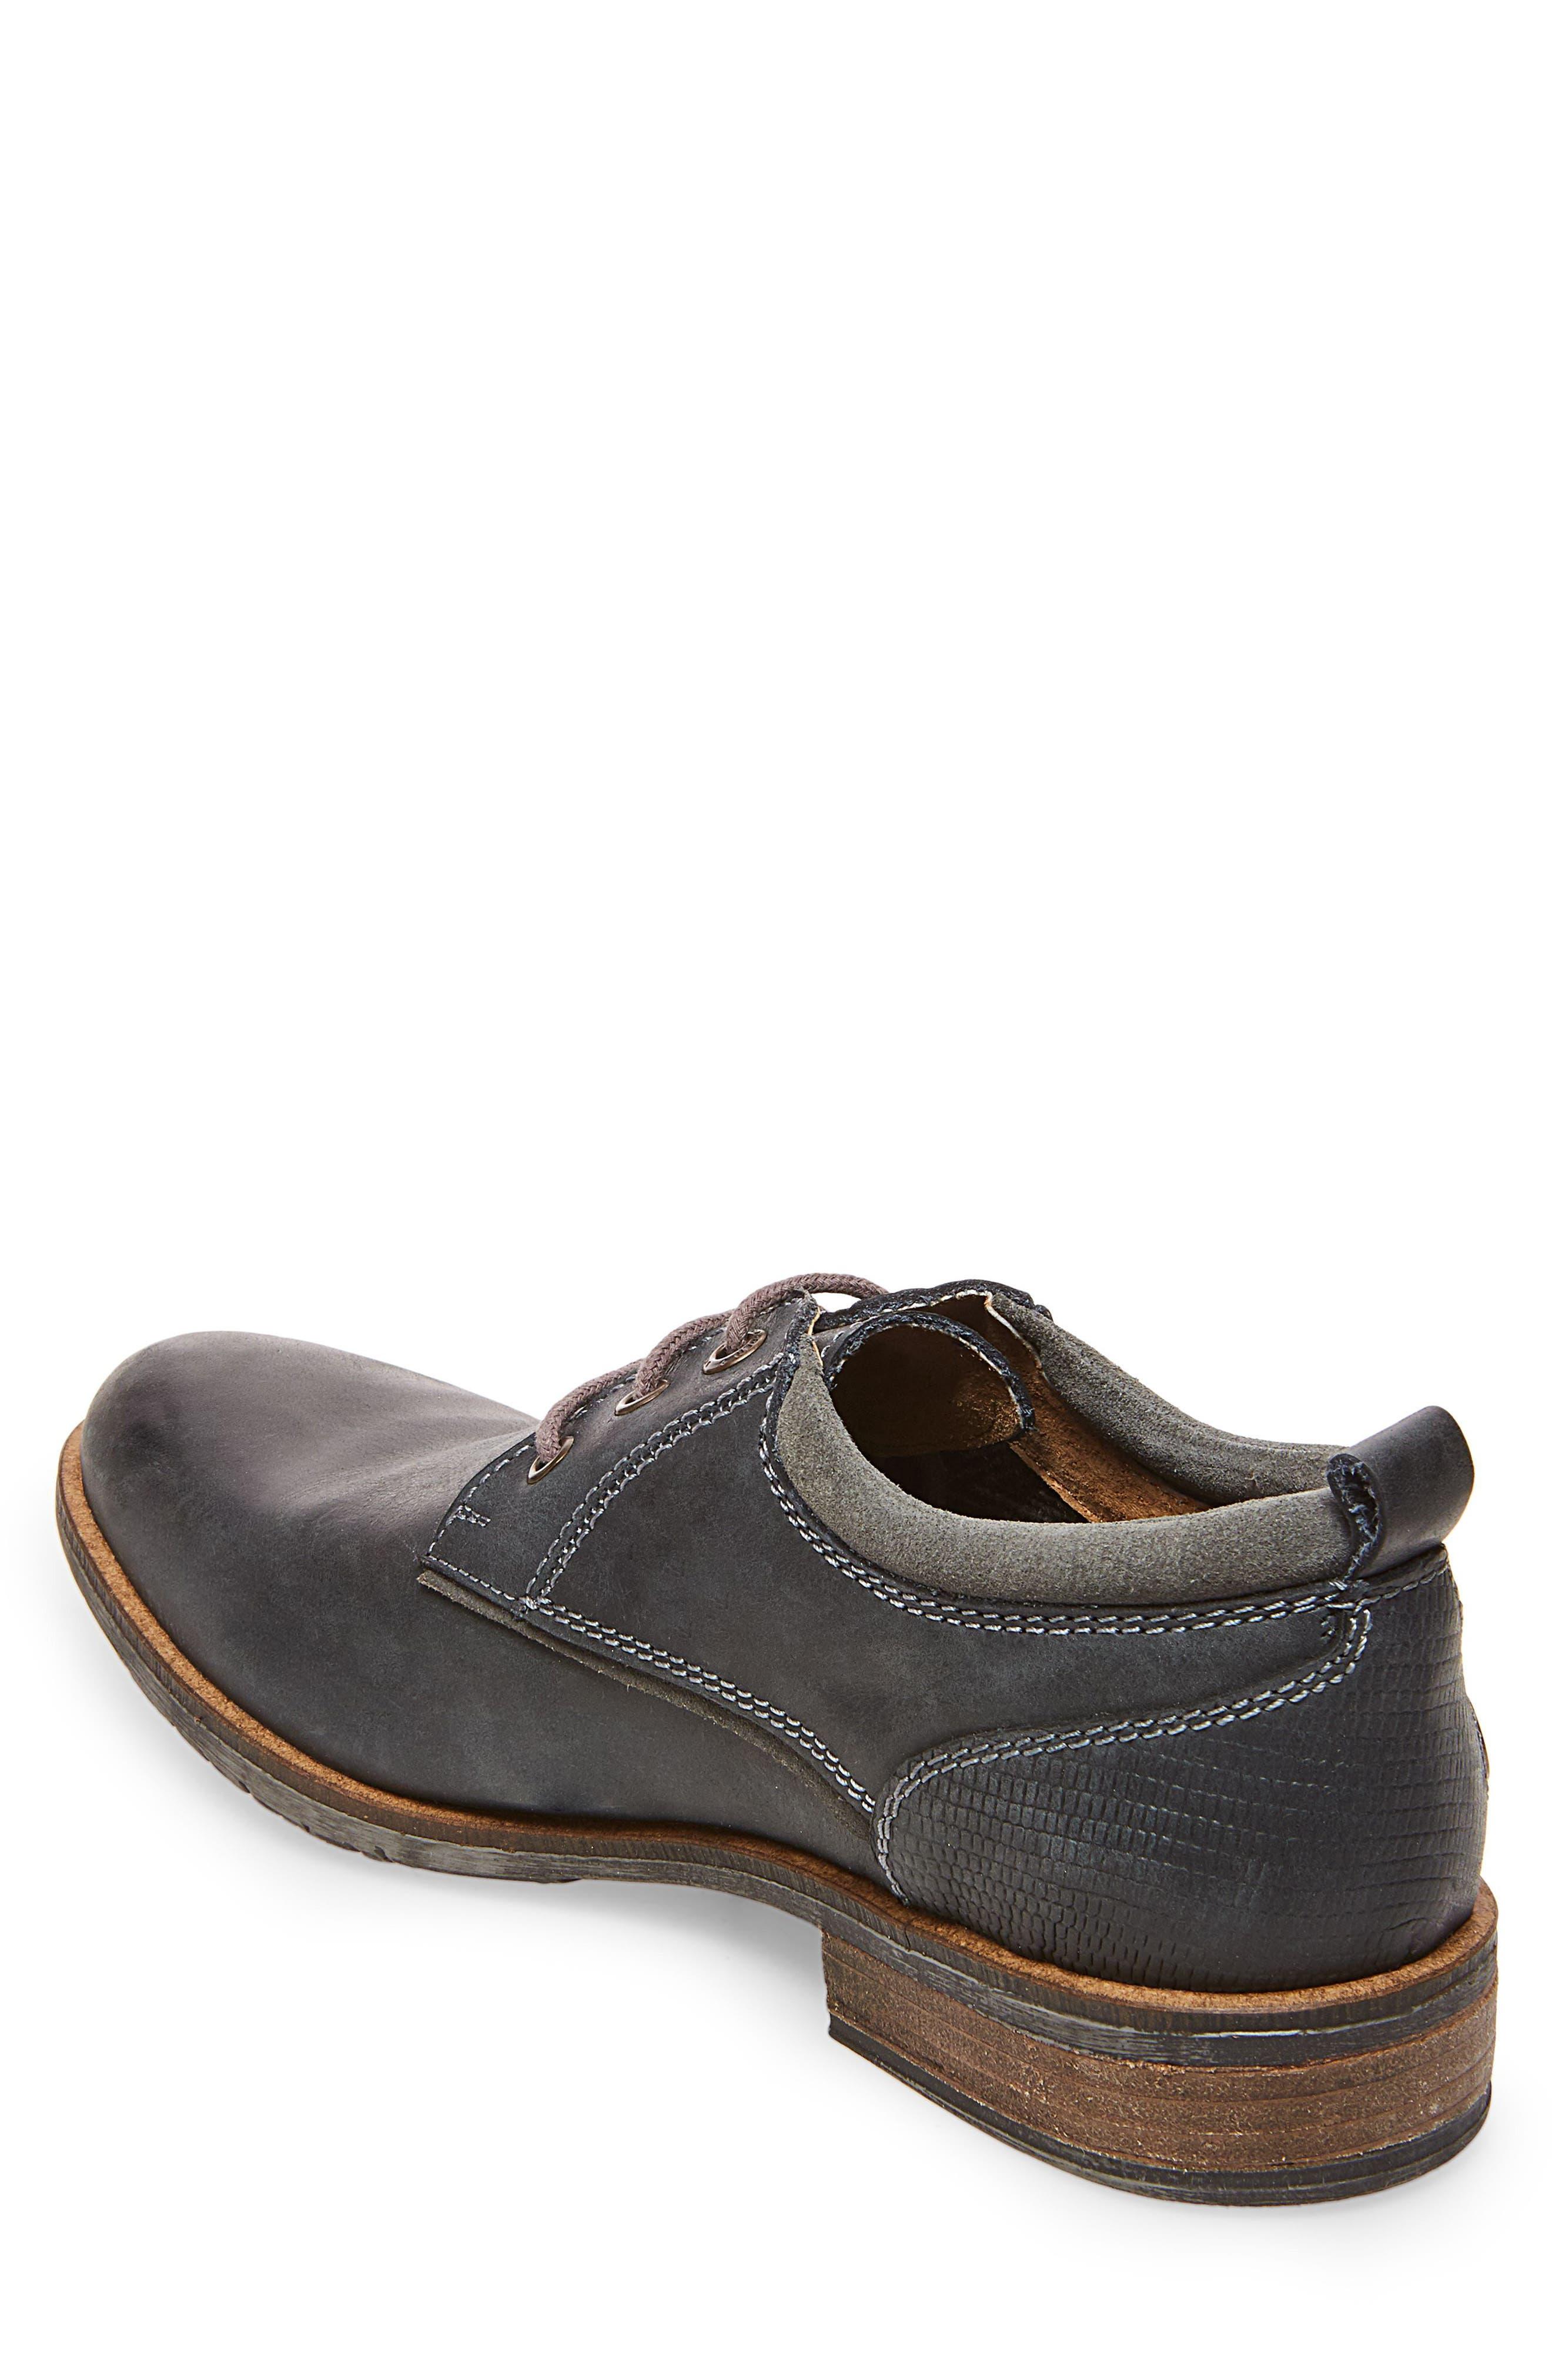 Narrate Plain Toe Derby,                             Alternate thumbnail 2, color,                             Black